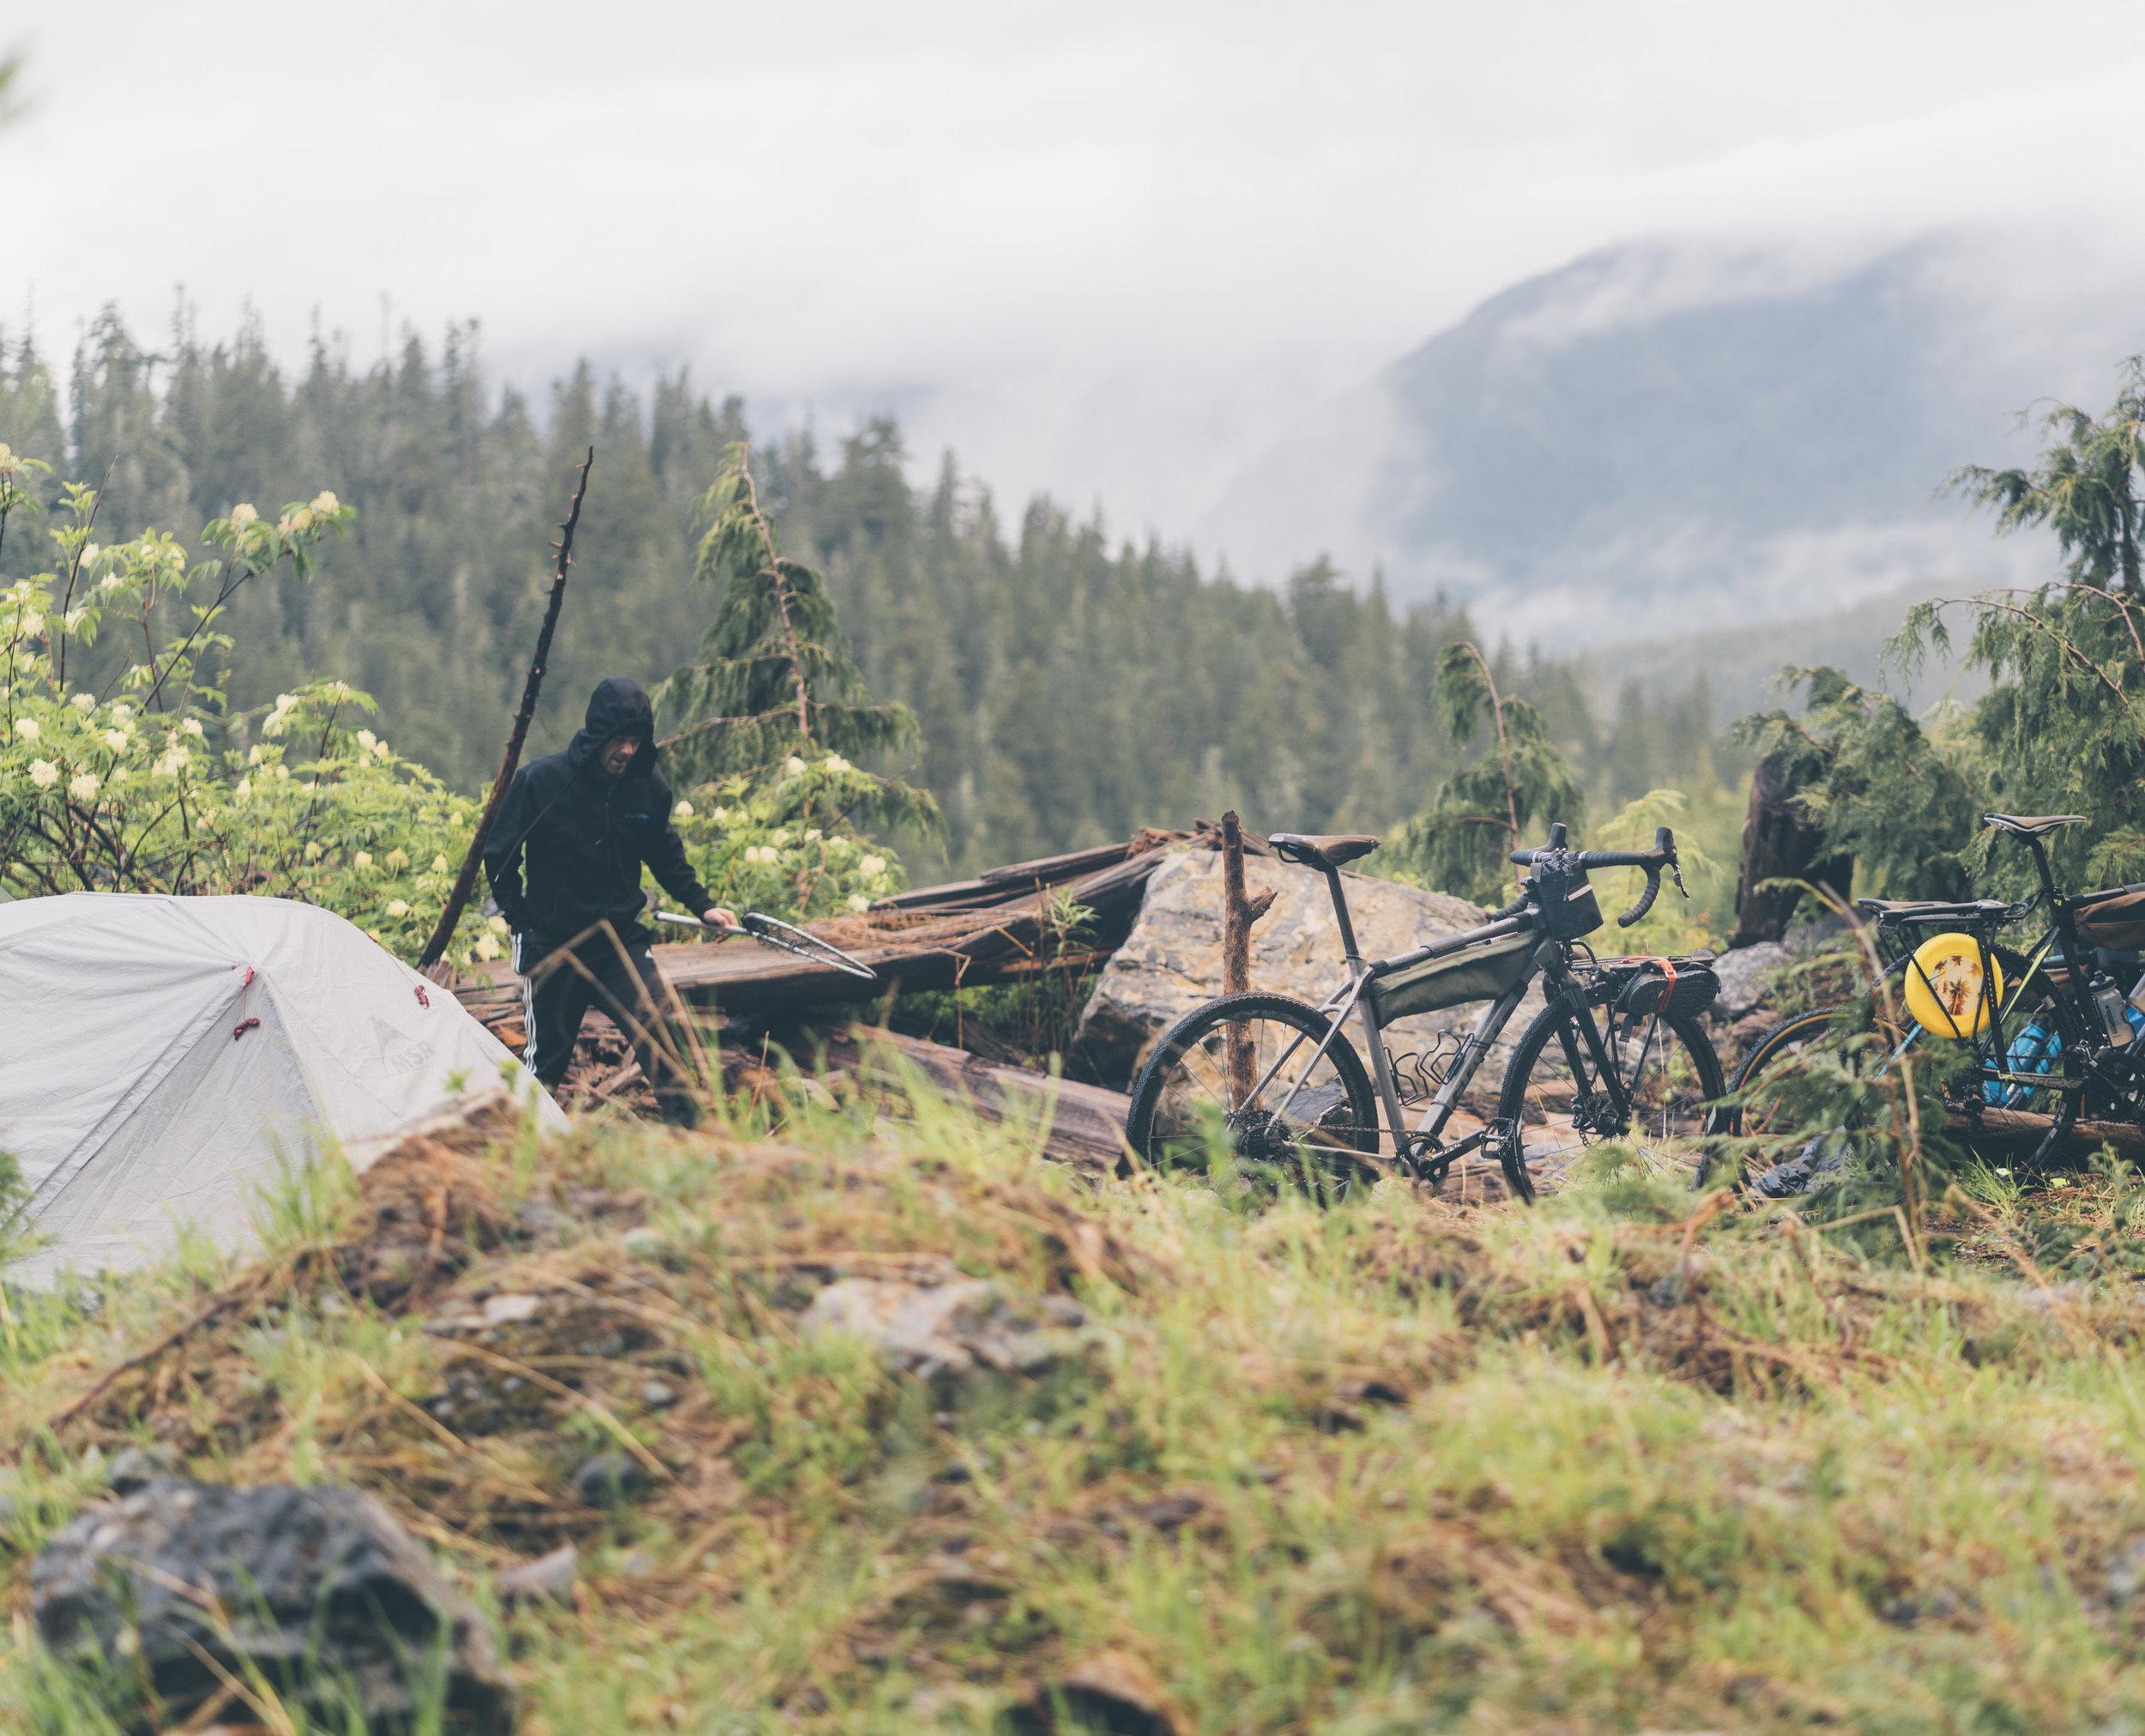 Bikepacking-VanIsland-JohnsonStudios-201806-83.jpg